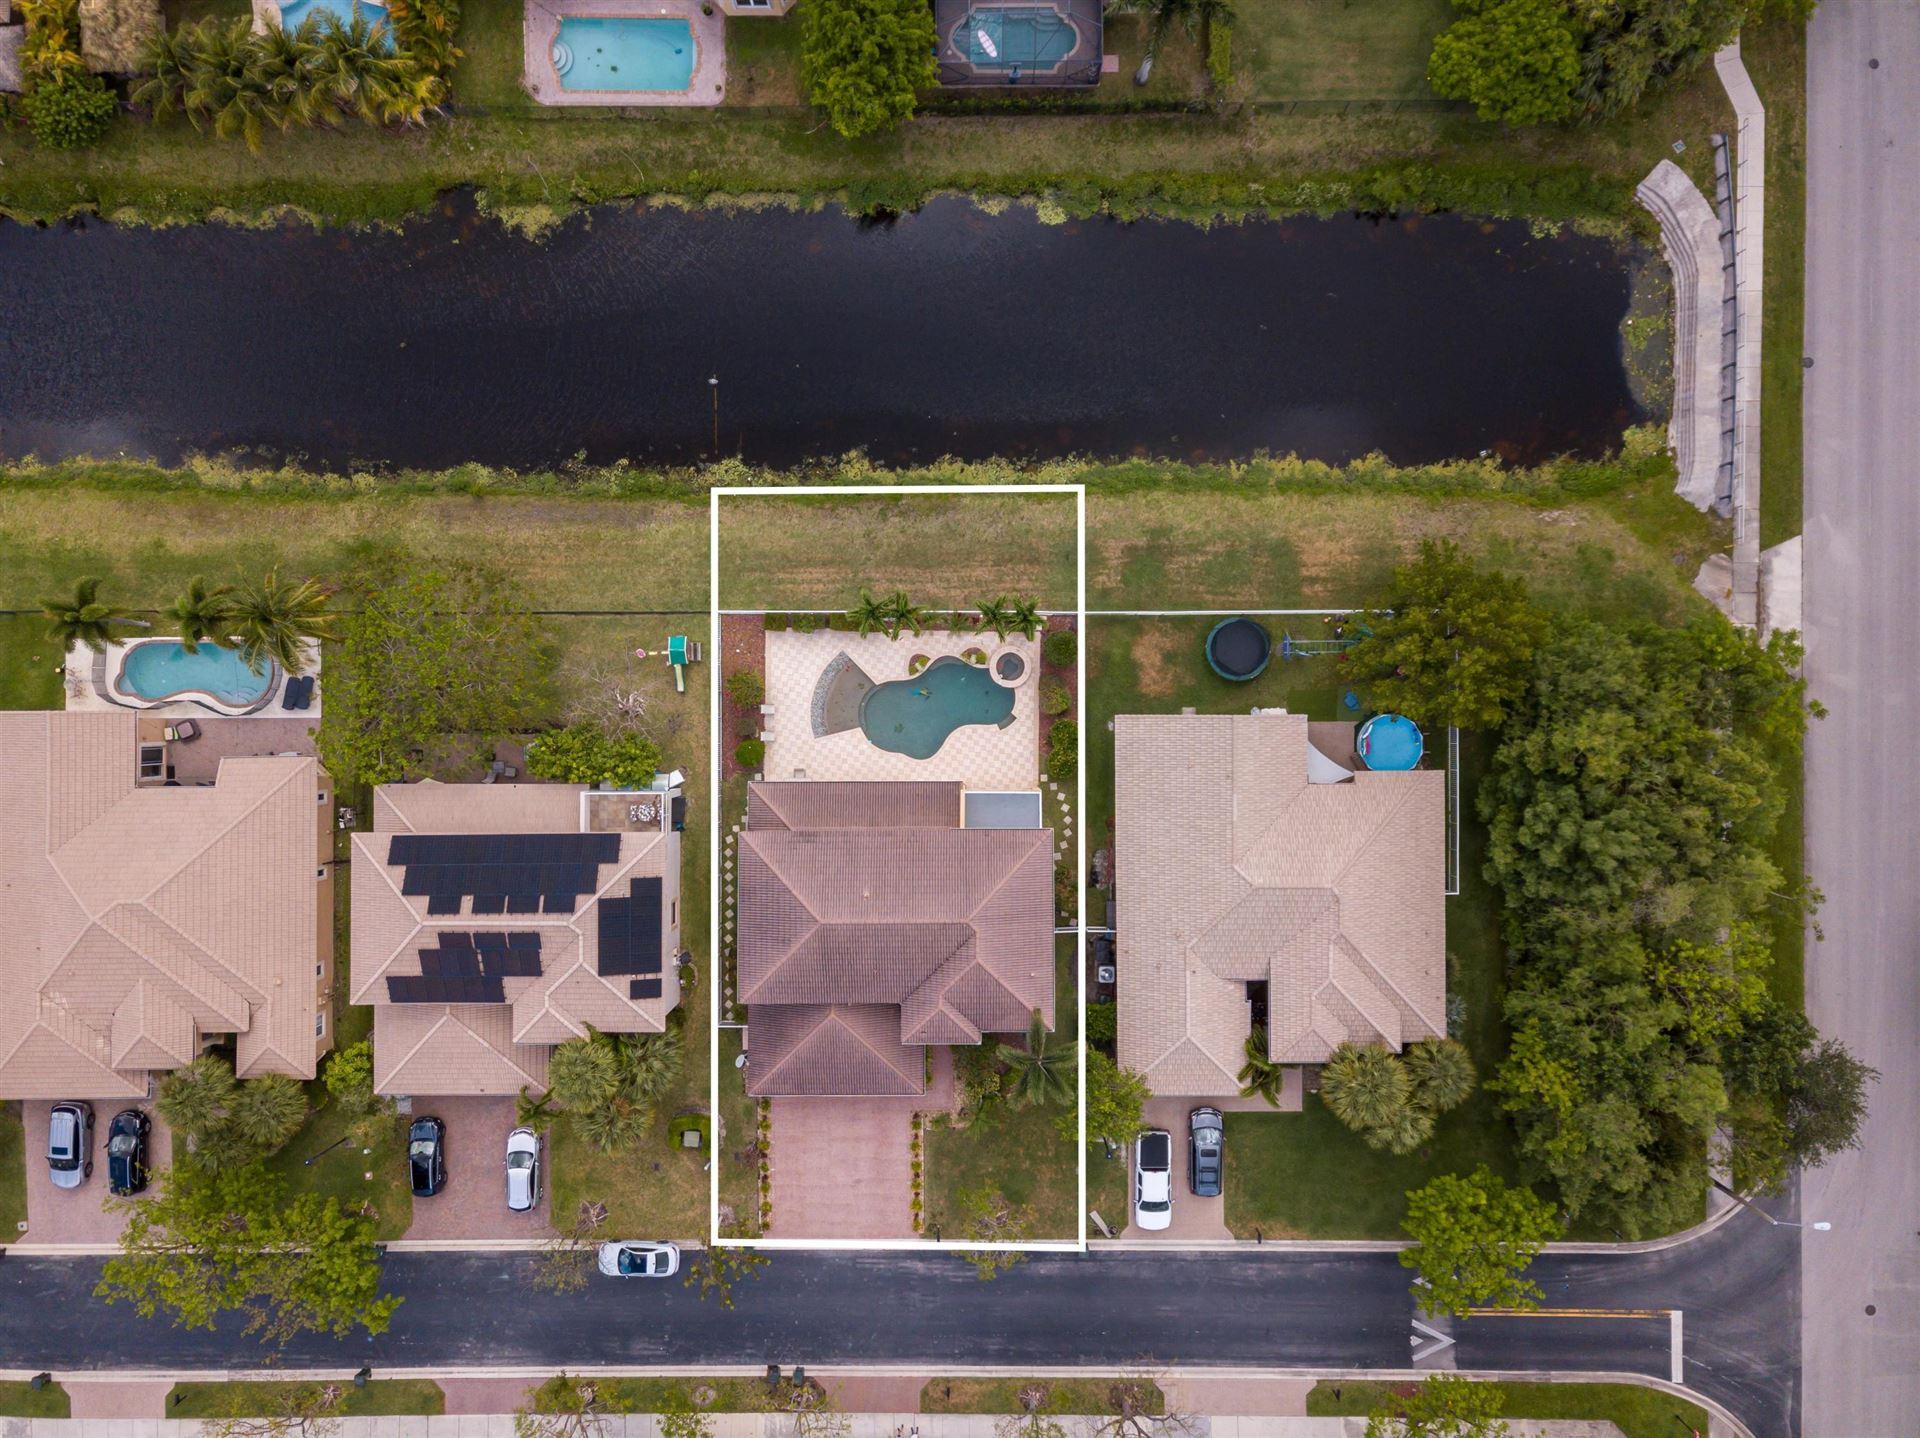 Photo of 7112 NW 48th Way, Coconut Creek, FL 33073 (MLS # RX-10716920)